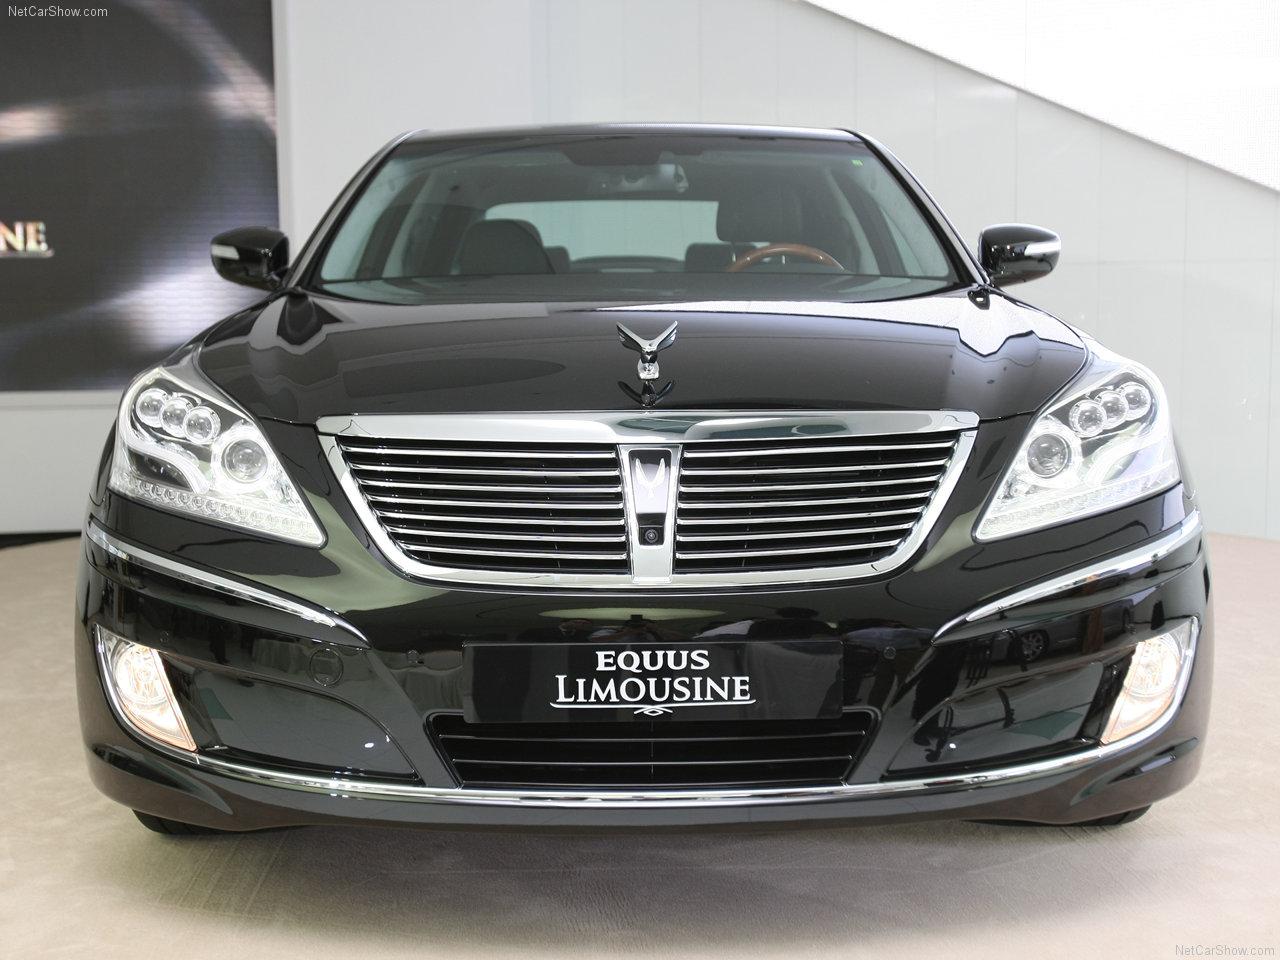 http://3.bp.blogspot.com/_lsyt_wQ2awY/TDnWIjkxHtI/AAAAAAAB9Xw/BD4_SaQLzRU/s1600/Hyundai-Equus_Limousine_2010_1280x960_wallpaper_06.jpg